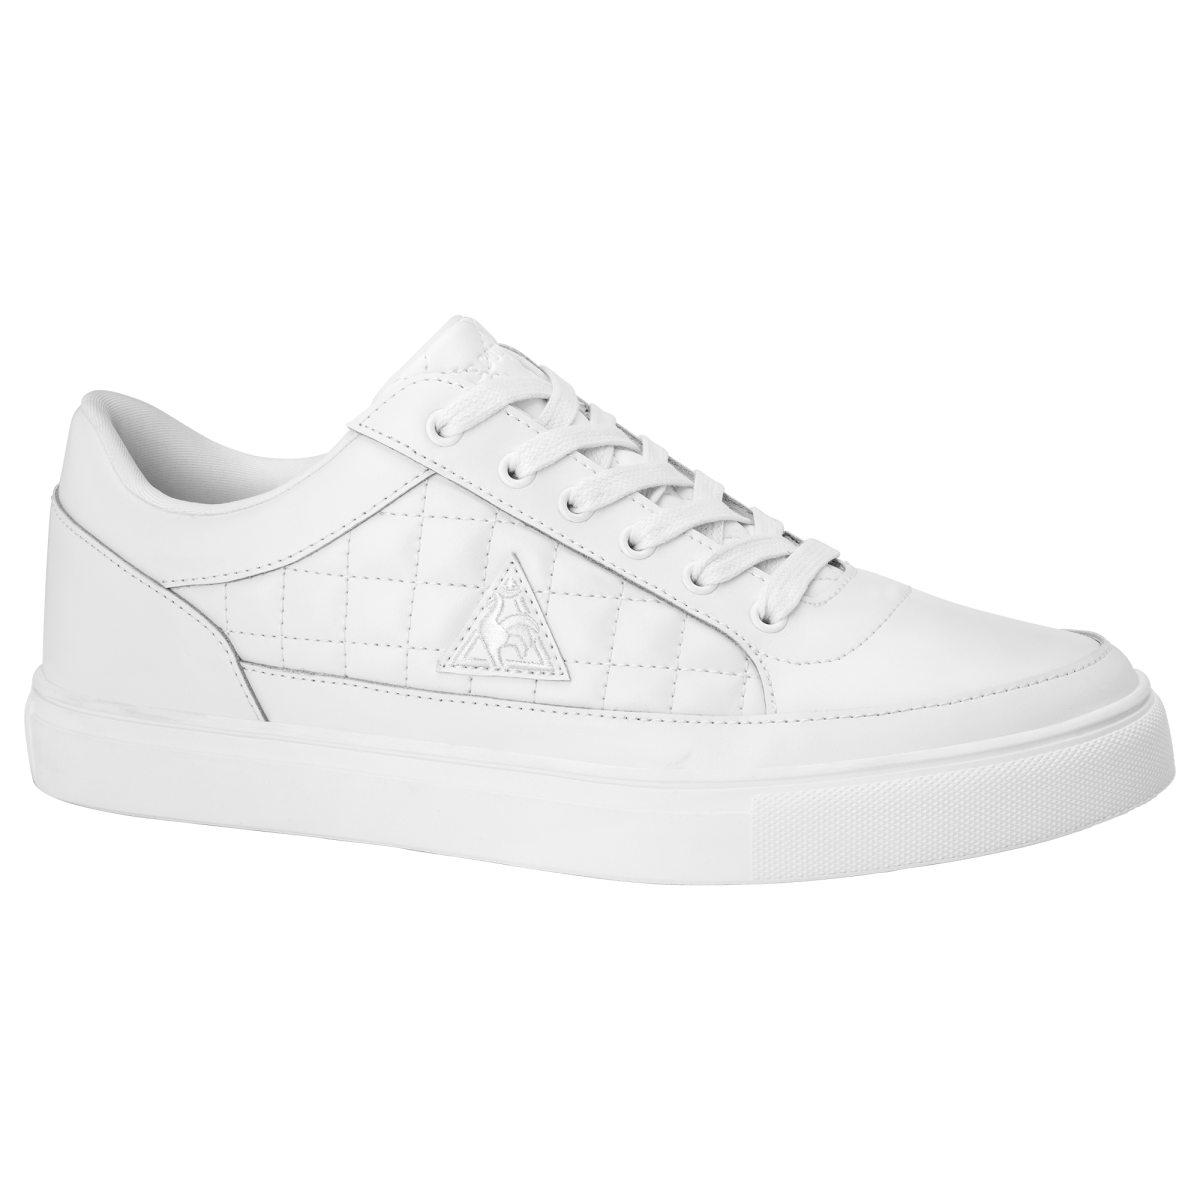 size 40 67f97 d18c0 le coq sportif philbert low leather fritidssko herr fritidsskor   sneakers